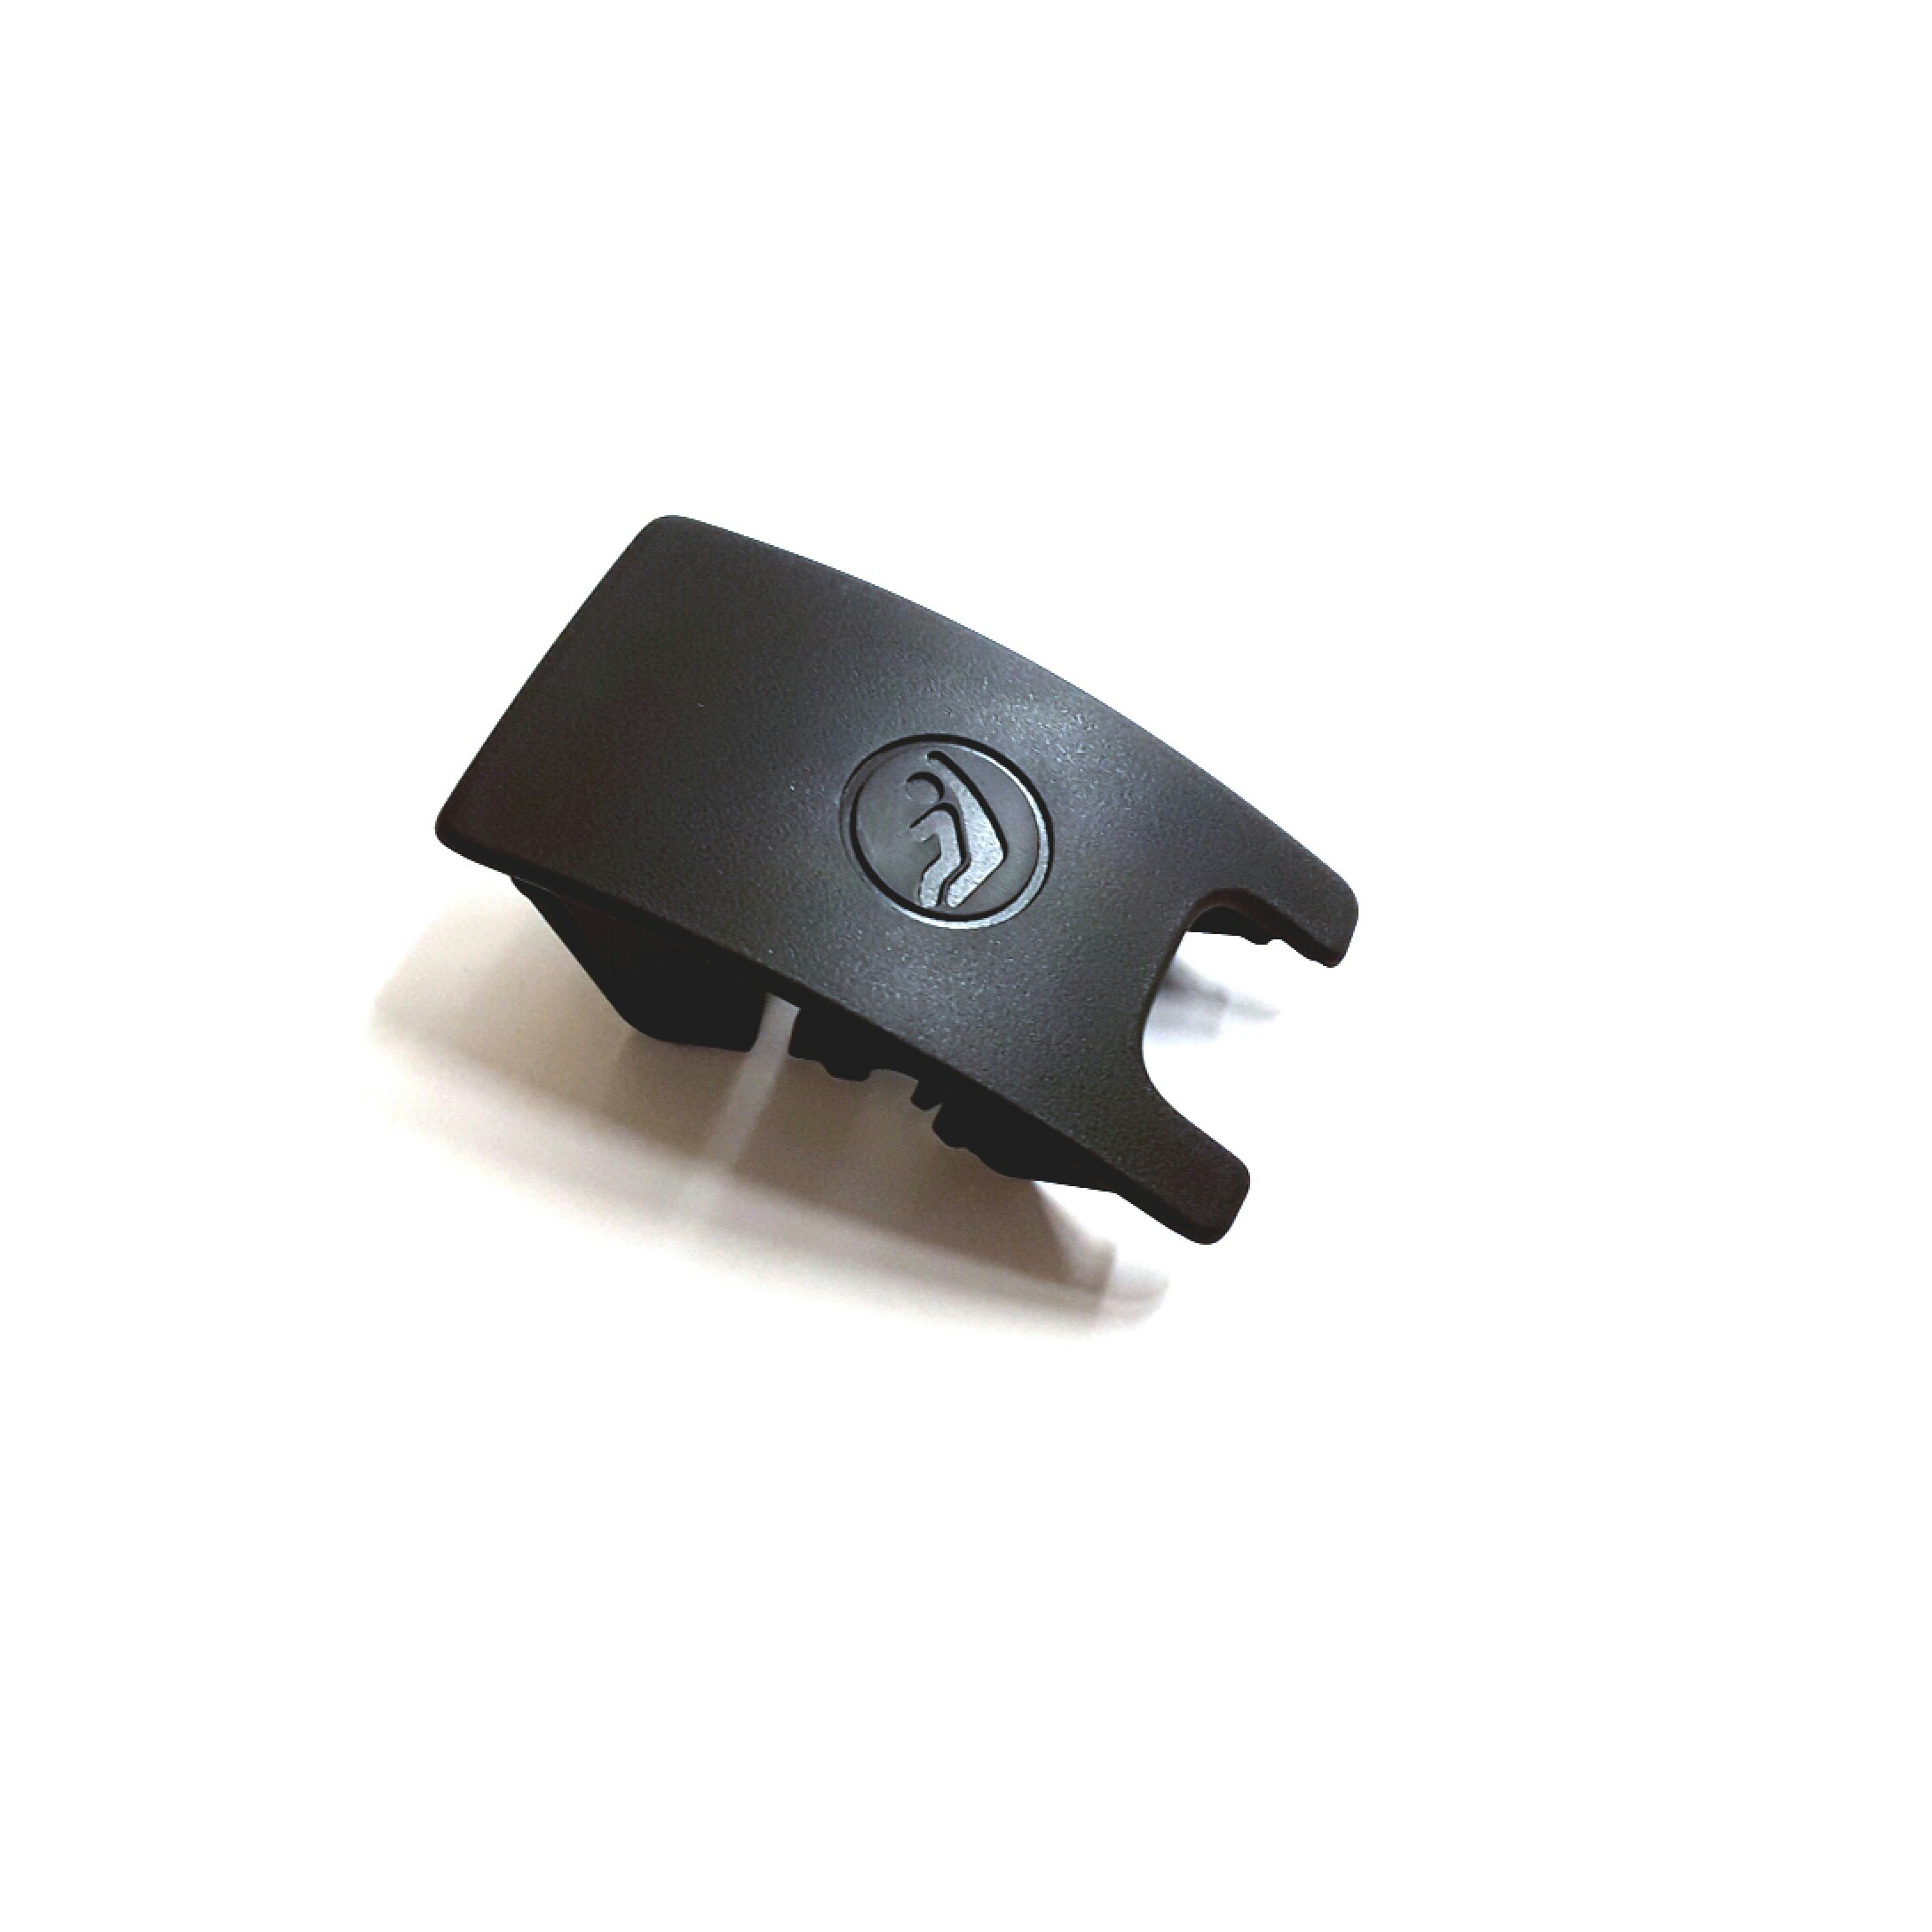 4g8887187 6ps Audi Sabre Black Seat Cushion Body